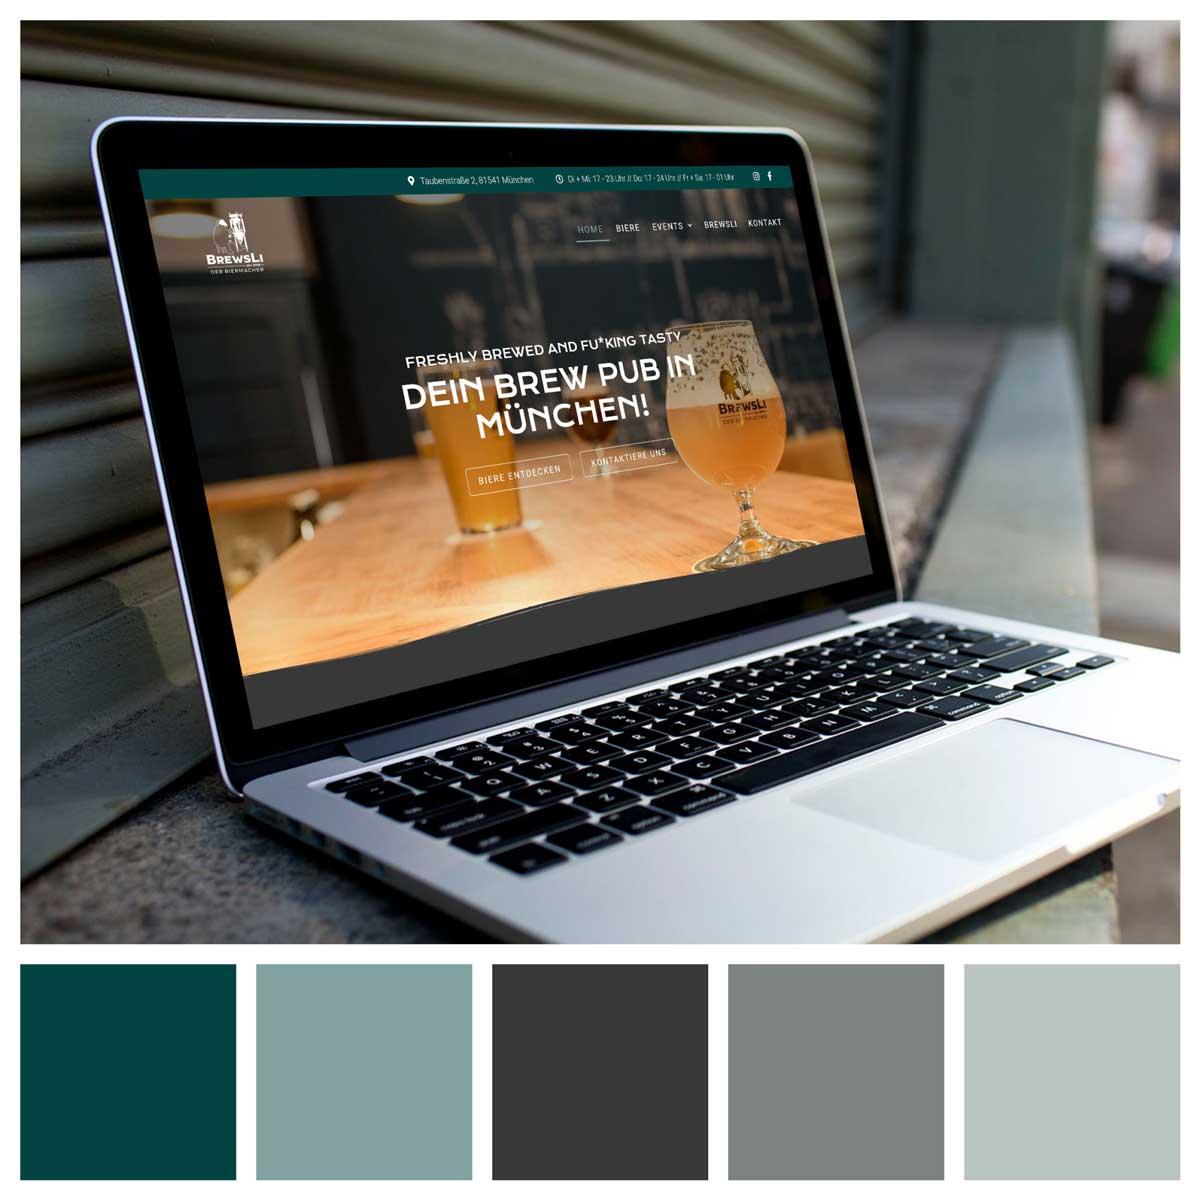 Maria-Grahmann-Portfolio-Projekt-BrewsLi-Webdesign-Pub